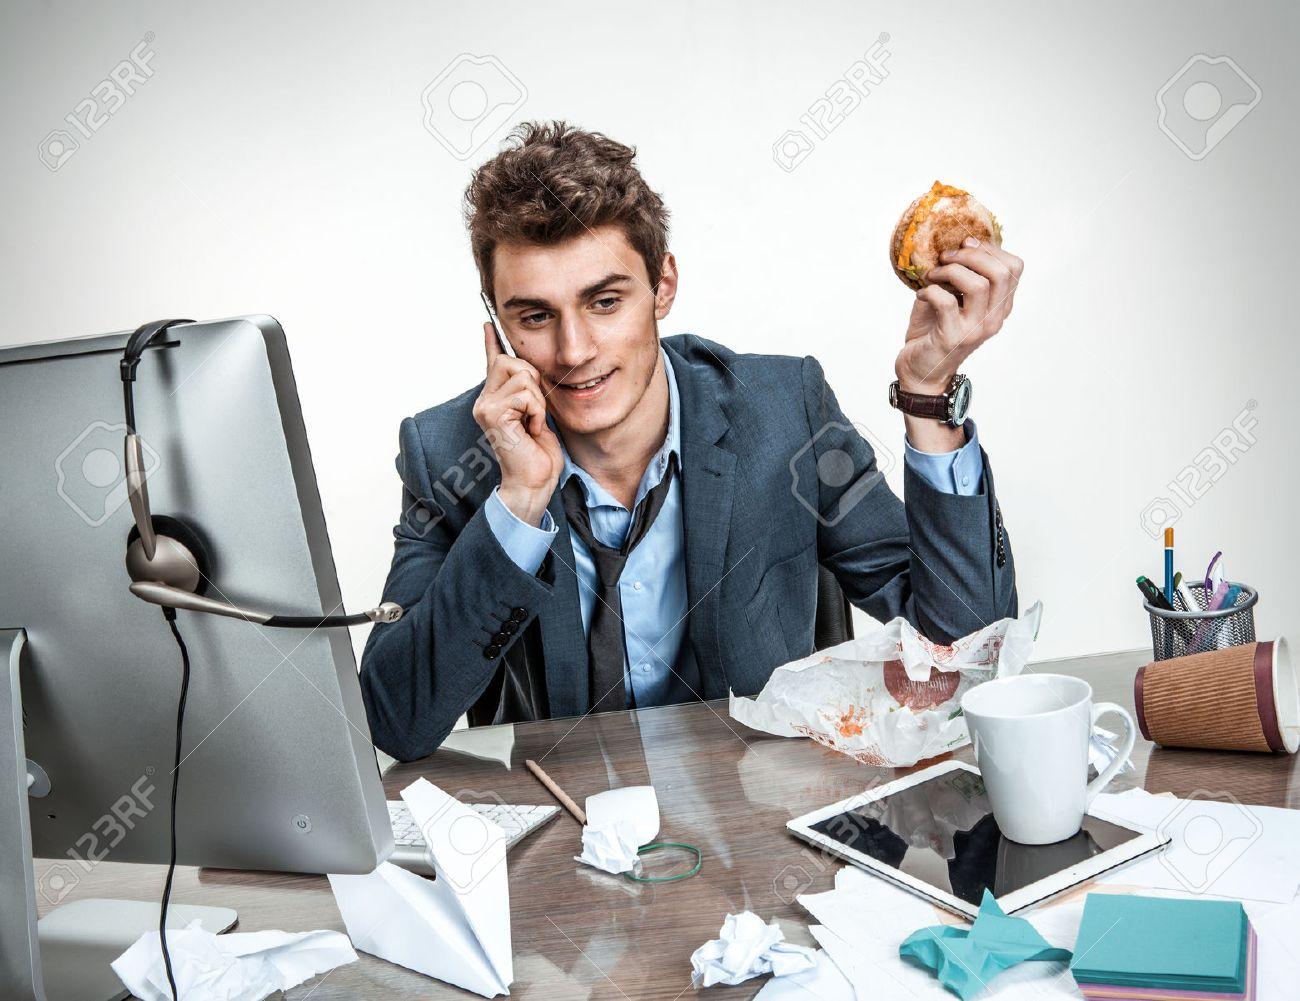 Moderne Buro Mann Ruft Bei Seinem Fruhstuck Am Arbeitsplatz